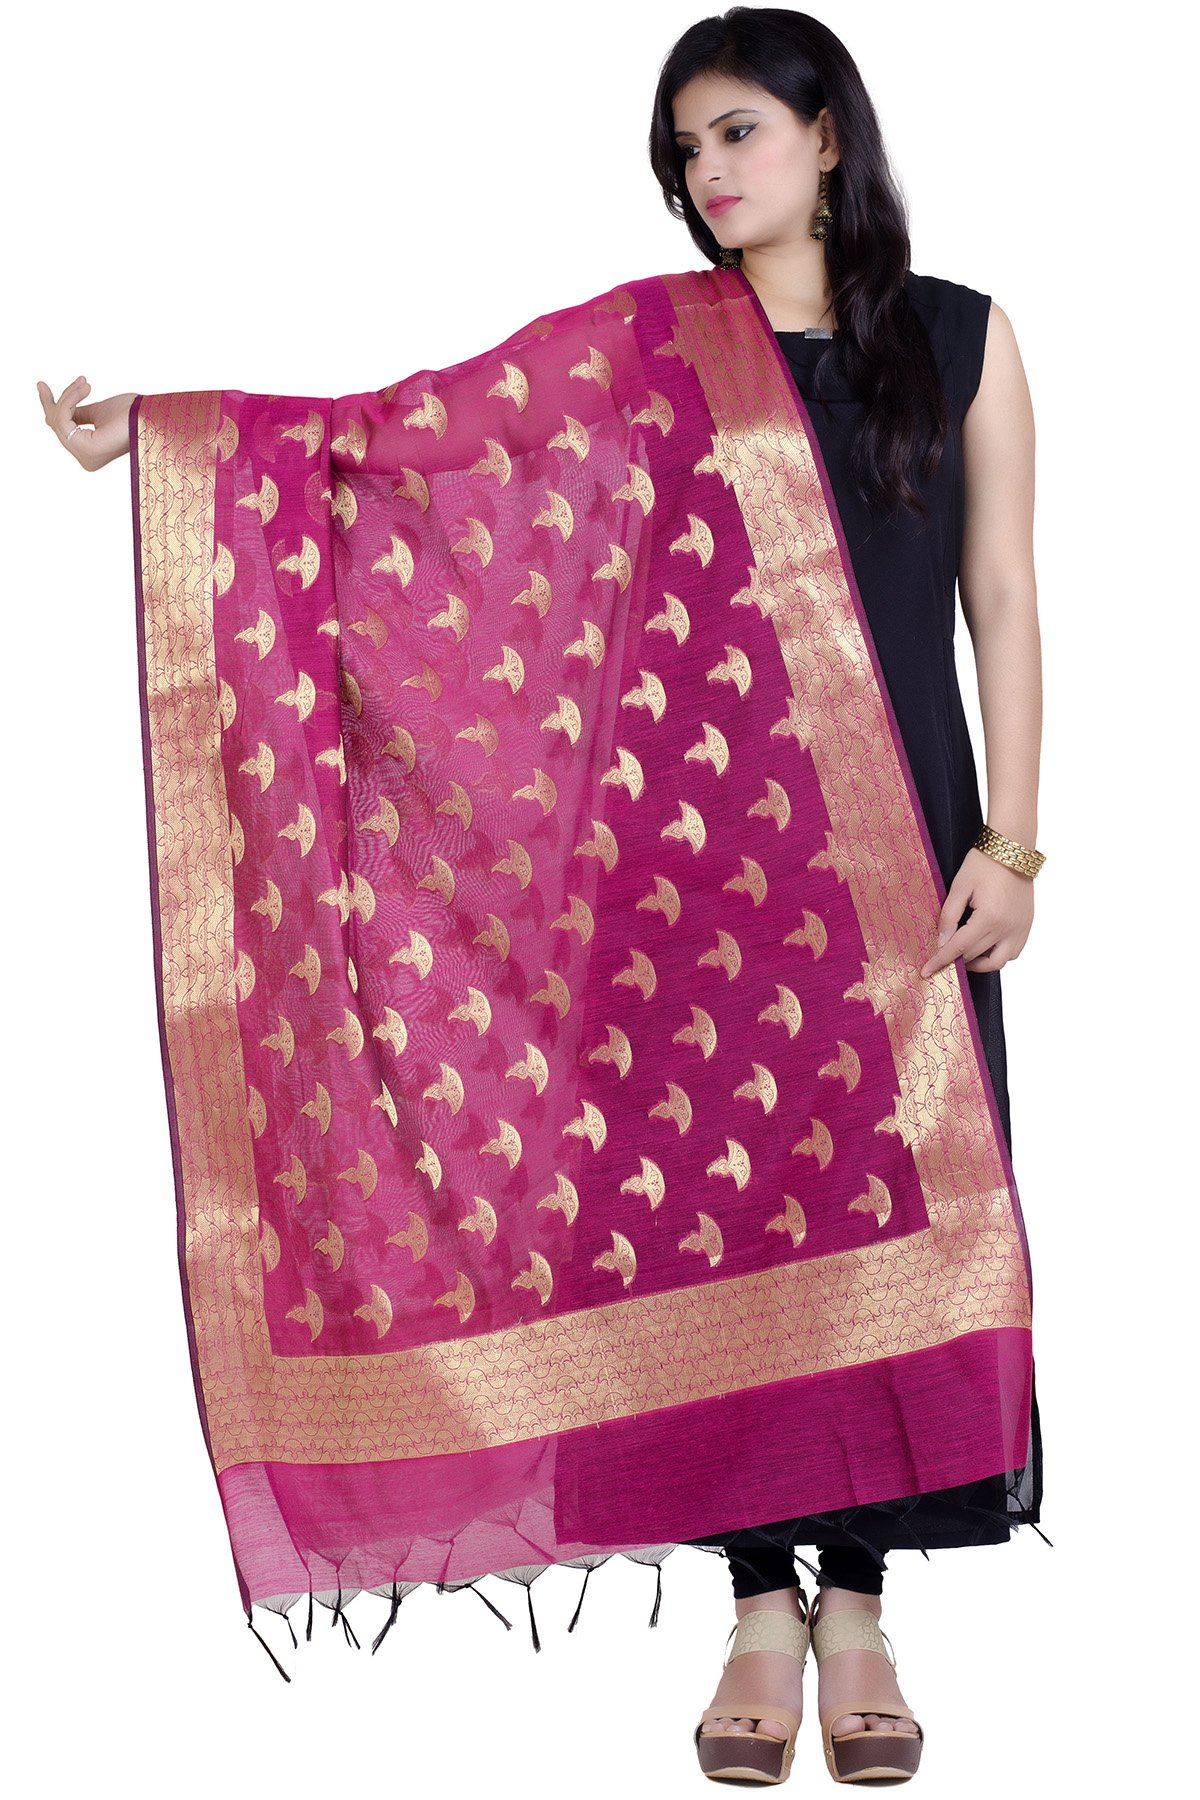 Chandrakala Women's Handwoven Zari Work Banarasi Dupatta Stole Scarf (Magenta)